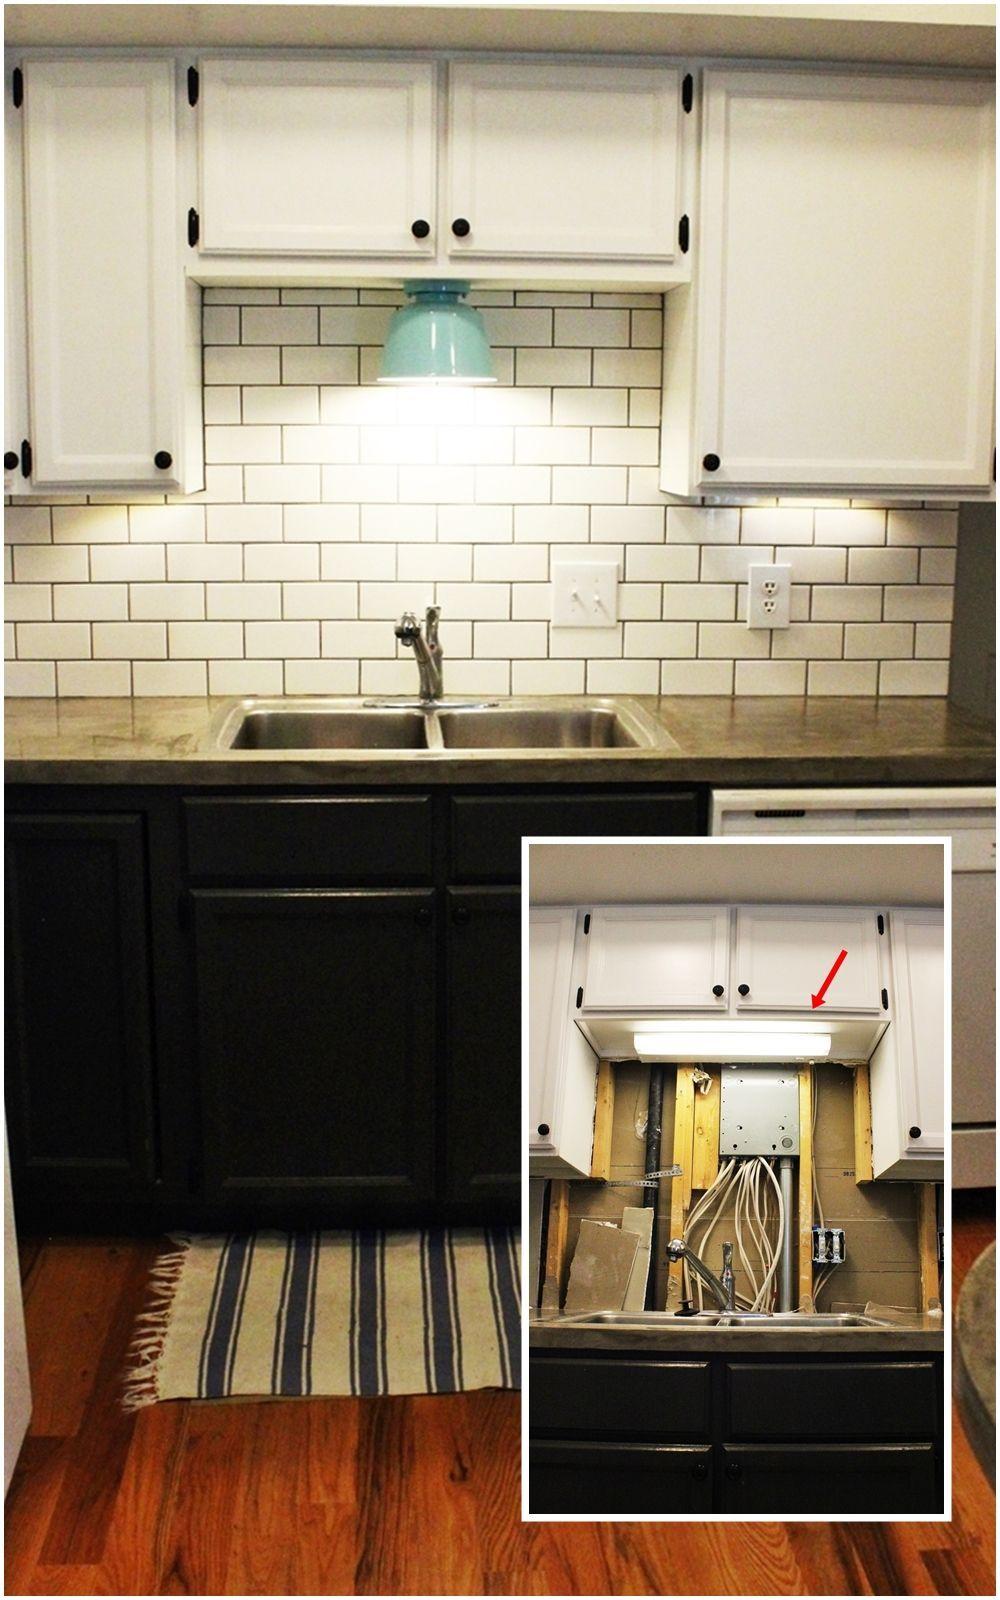 diy kitchen lighting upgrade under kitchen cabinet lights DIY Kitchen Lighting Upgrade LED Under Cabinet Lights Above the Sink Light